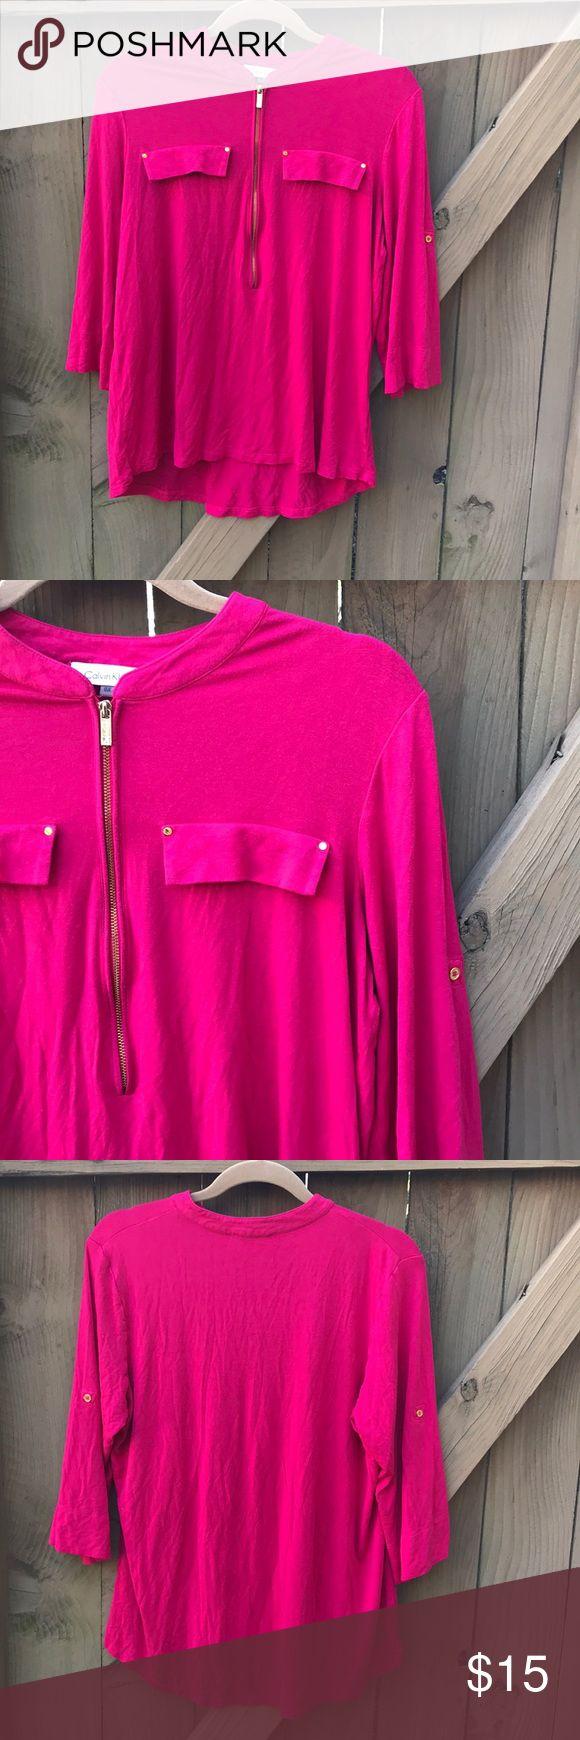 Calvin Klein hot pink blouse size 0X Calvin Klein hot pink blouse size 0X: armpit to armpit 20 in, shoulder to hem 26 in. Bin 18. Calvin Klein Tops Blouses